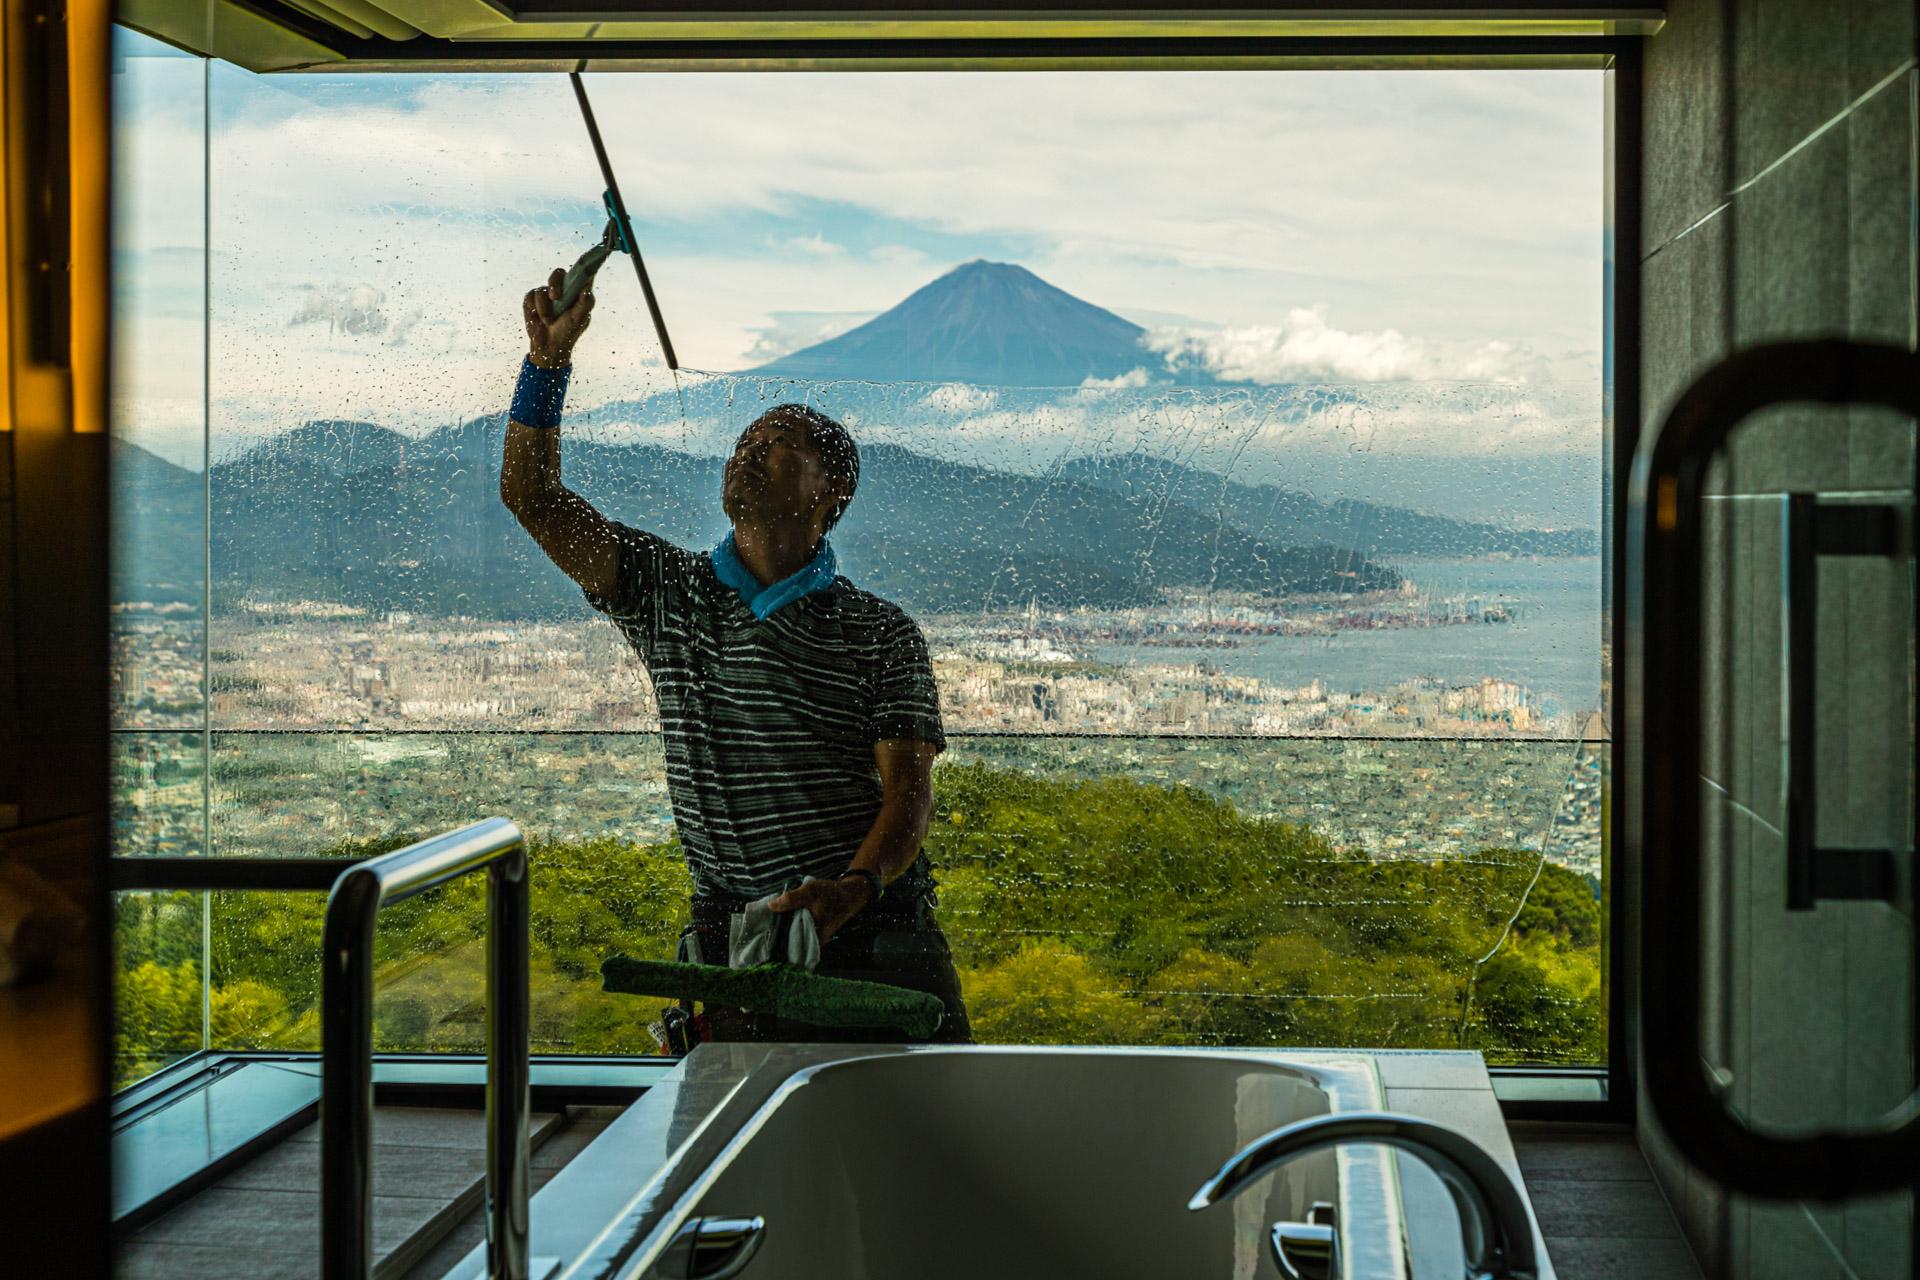 Window Cleaner of Nippondaira Hotel, Shizuoka, Japan with view on Mount Fuji